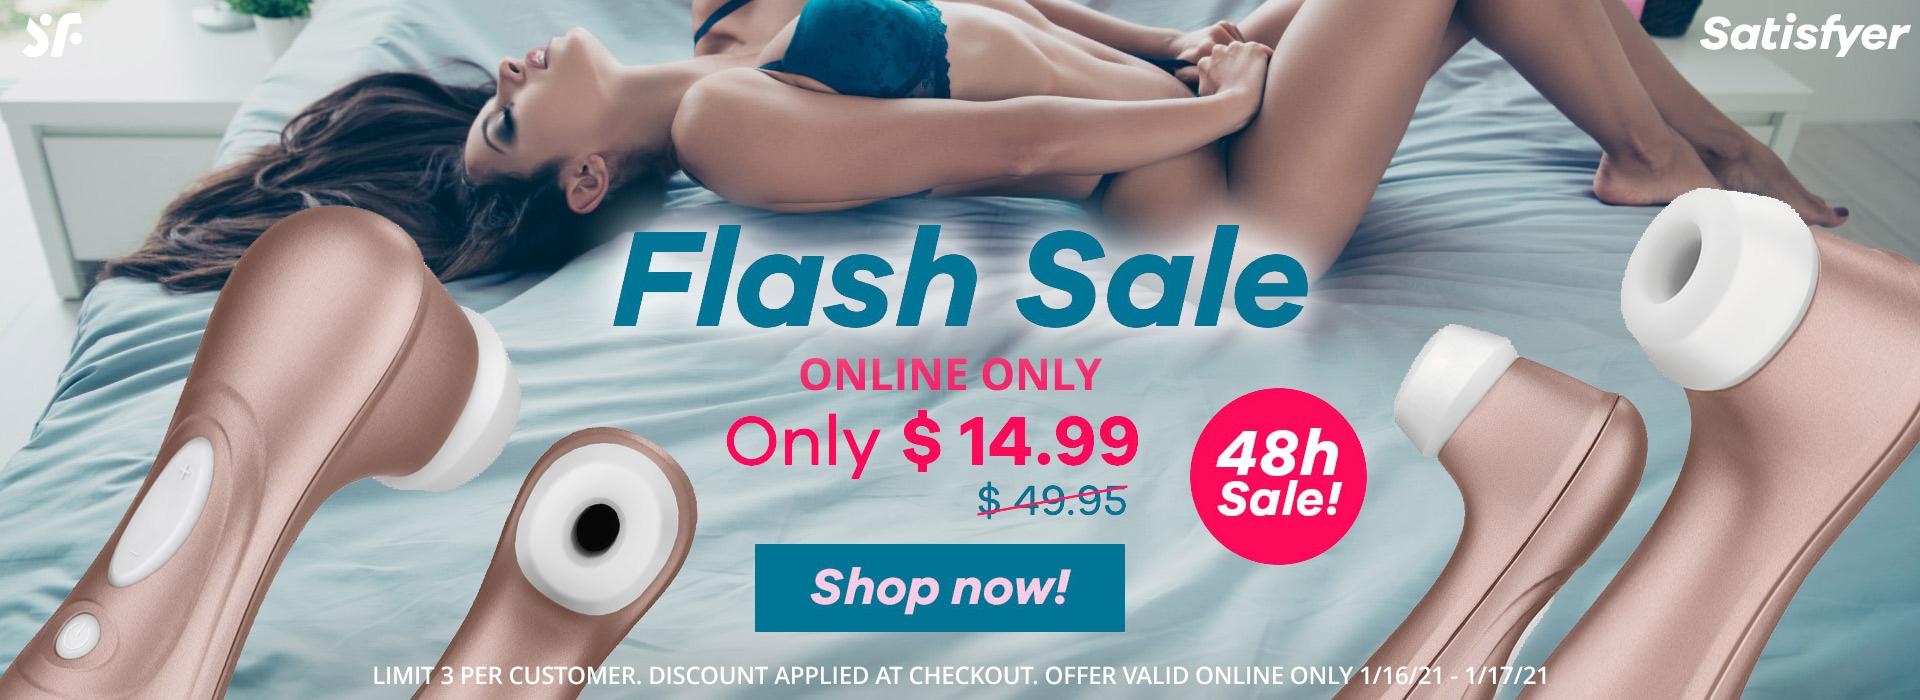 Satisfyer Flash Sale Only $14.99!